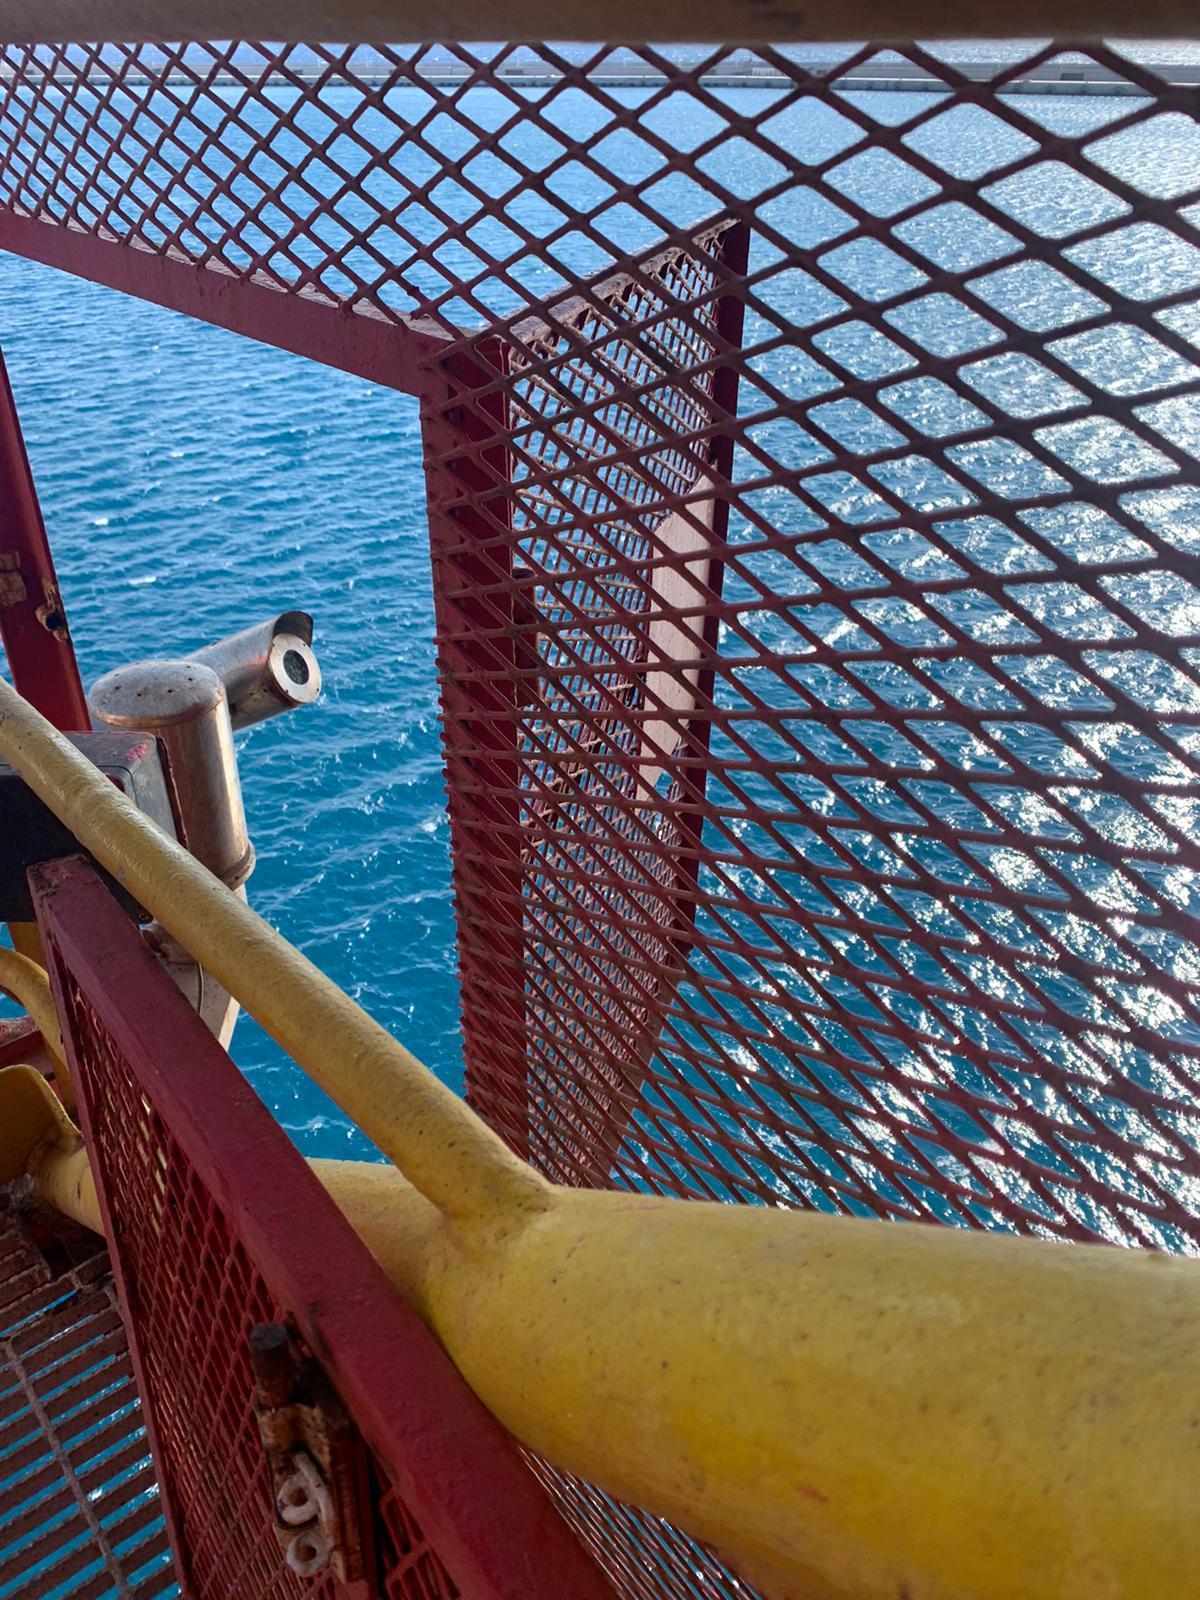 Stairwell grille vessel hardening